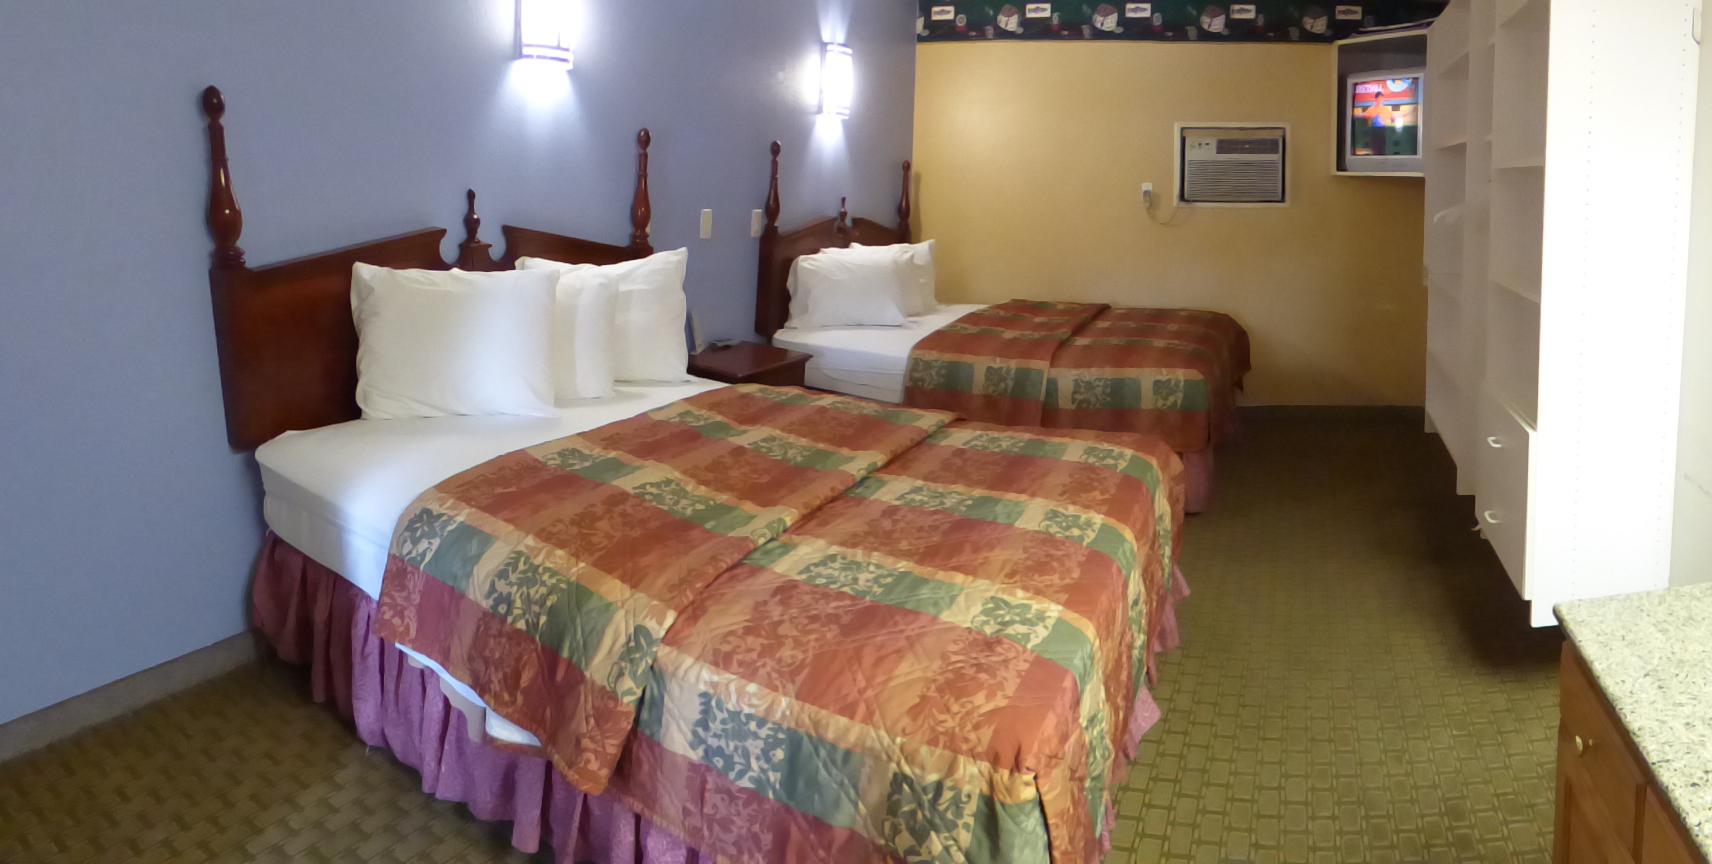 Coronado Hotel St George Utah